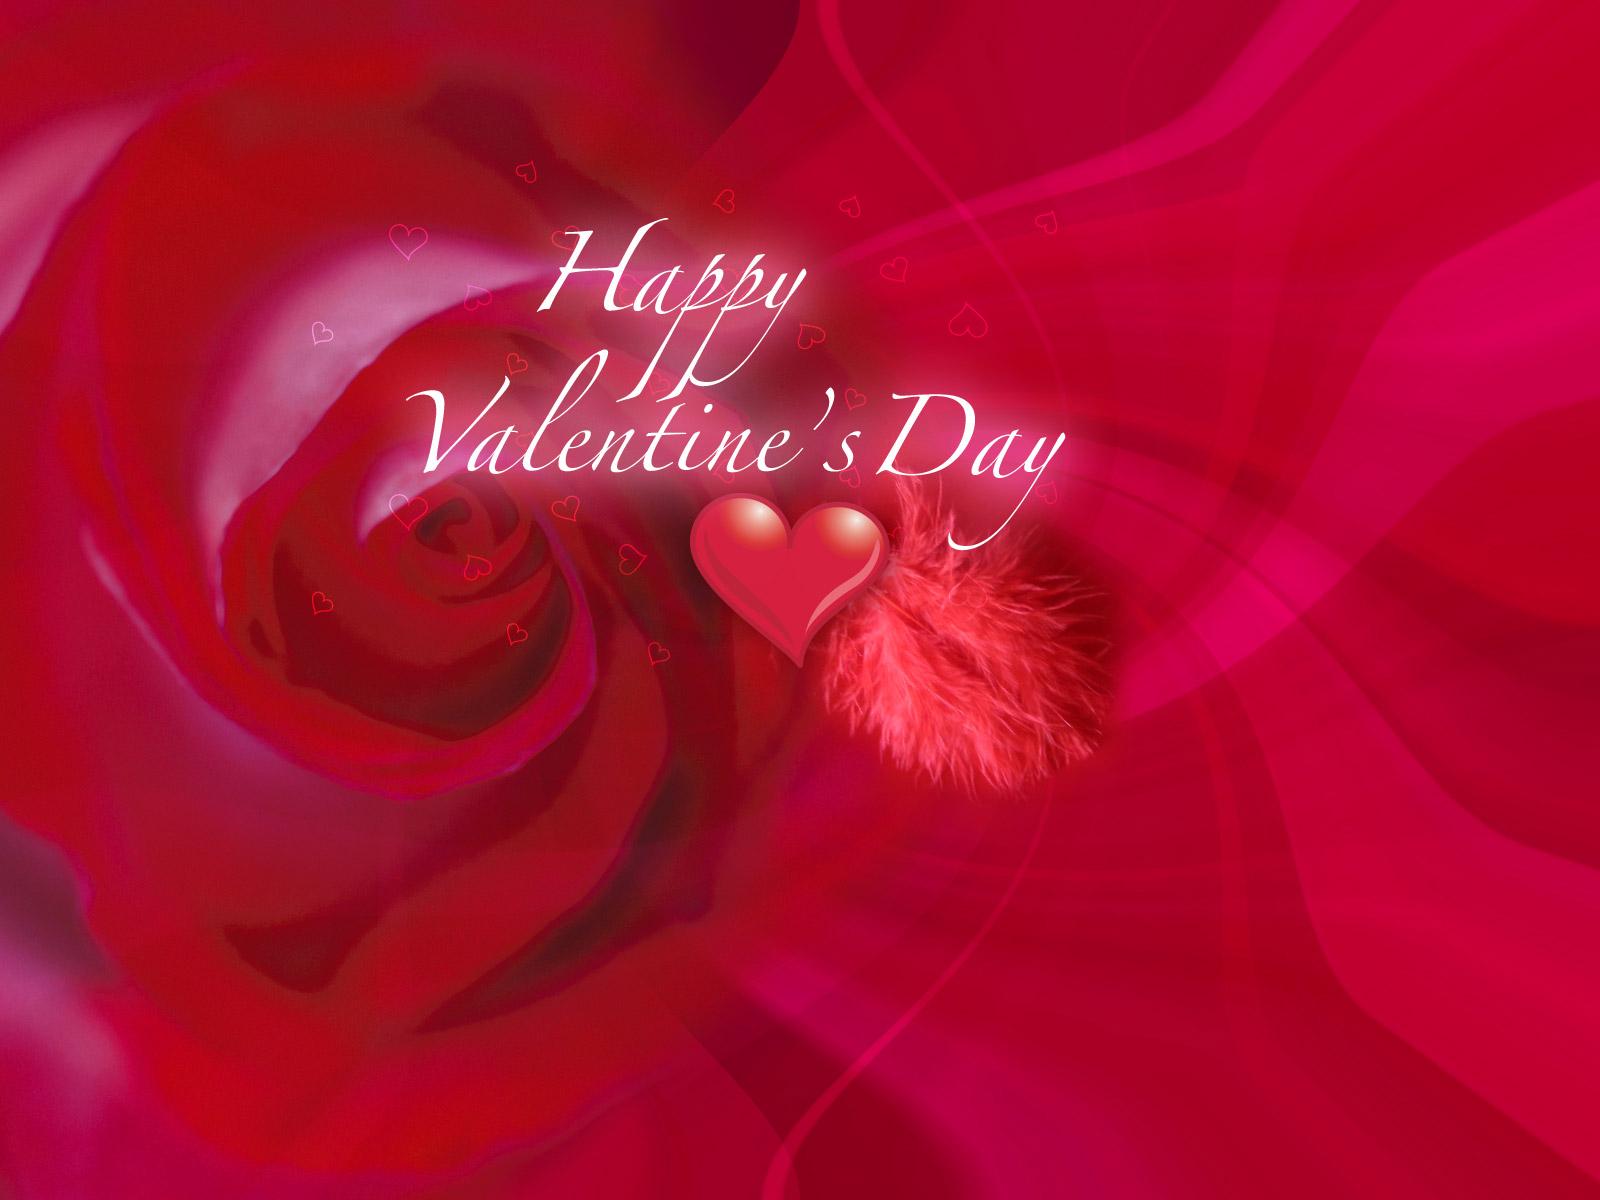 http://4.bp.blogspot.com/-HP_hIxowRhU/TybjRwggYhI/AAAAAAAAHtc/7qqe_nKOl9c/s1600/valentines%2Bday%2Bwallpaper%2Bfor%2BDesktop.jpg